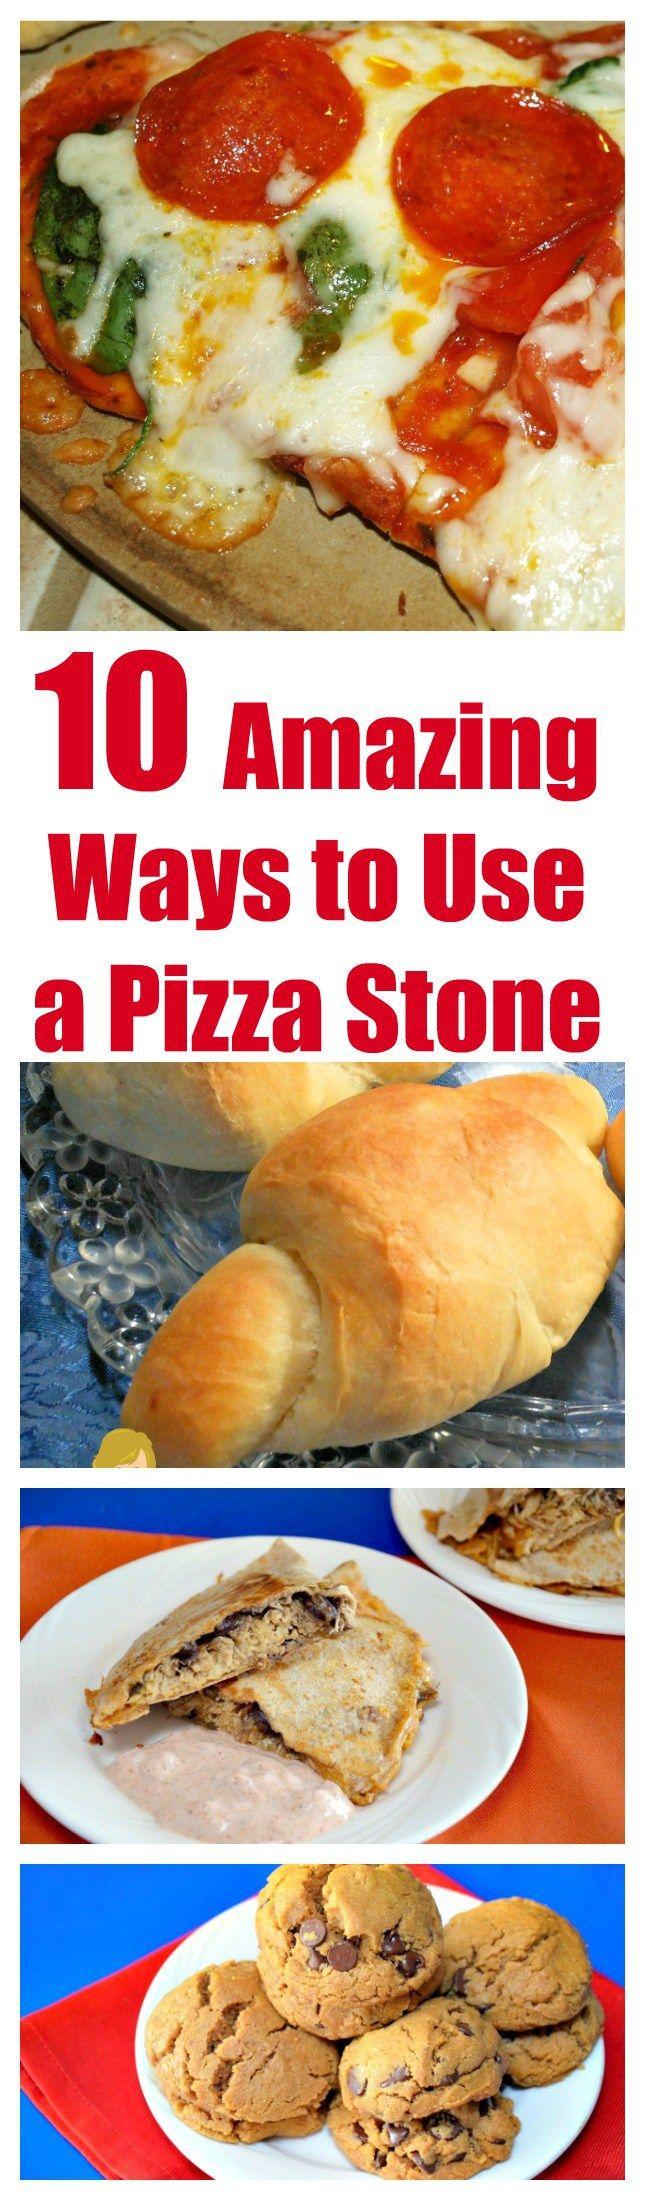 10 Amazing Ways to Use a Pizza Stone #pizza stone #pizza stones #10 Amazing Ways to Use a Pizza Stone #kitchen #kitchen tips